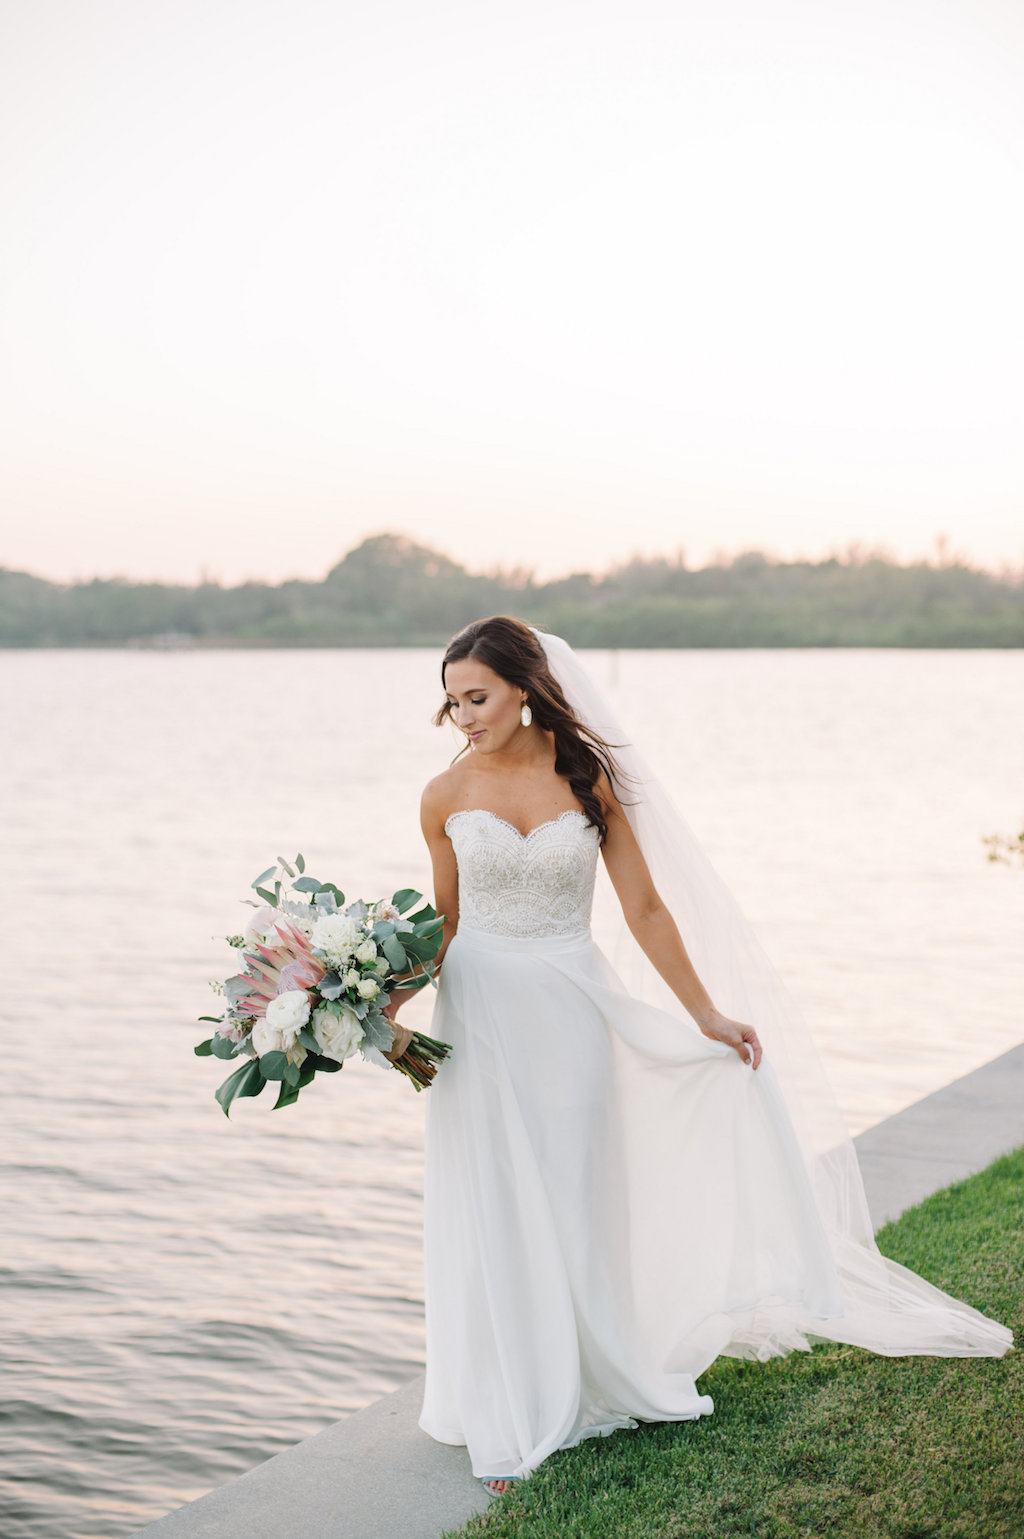 Organic Greenery Inspired Neutral Pastel Wedding Ceremony Arch for Outdoor Waterfront Siesta Key Wedding | Sarasota Wedding Planner Jennifer Matteo Events